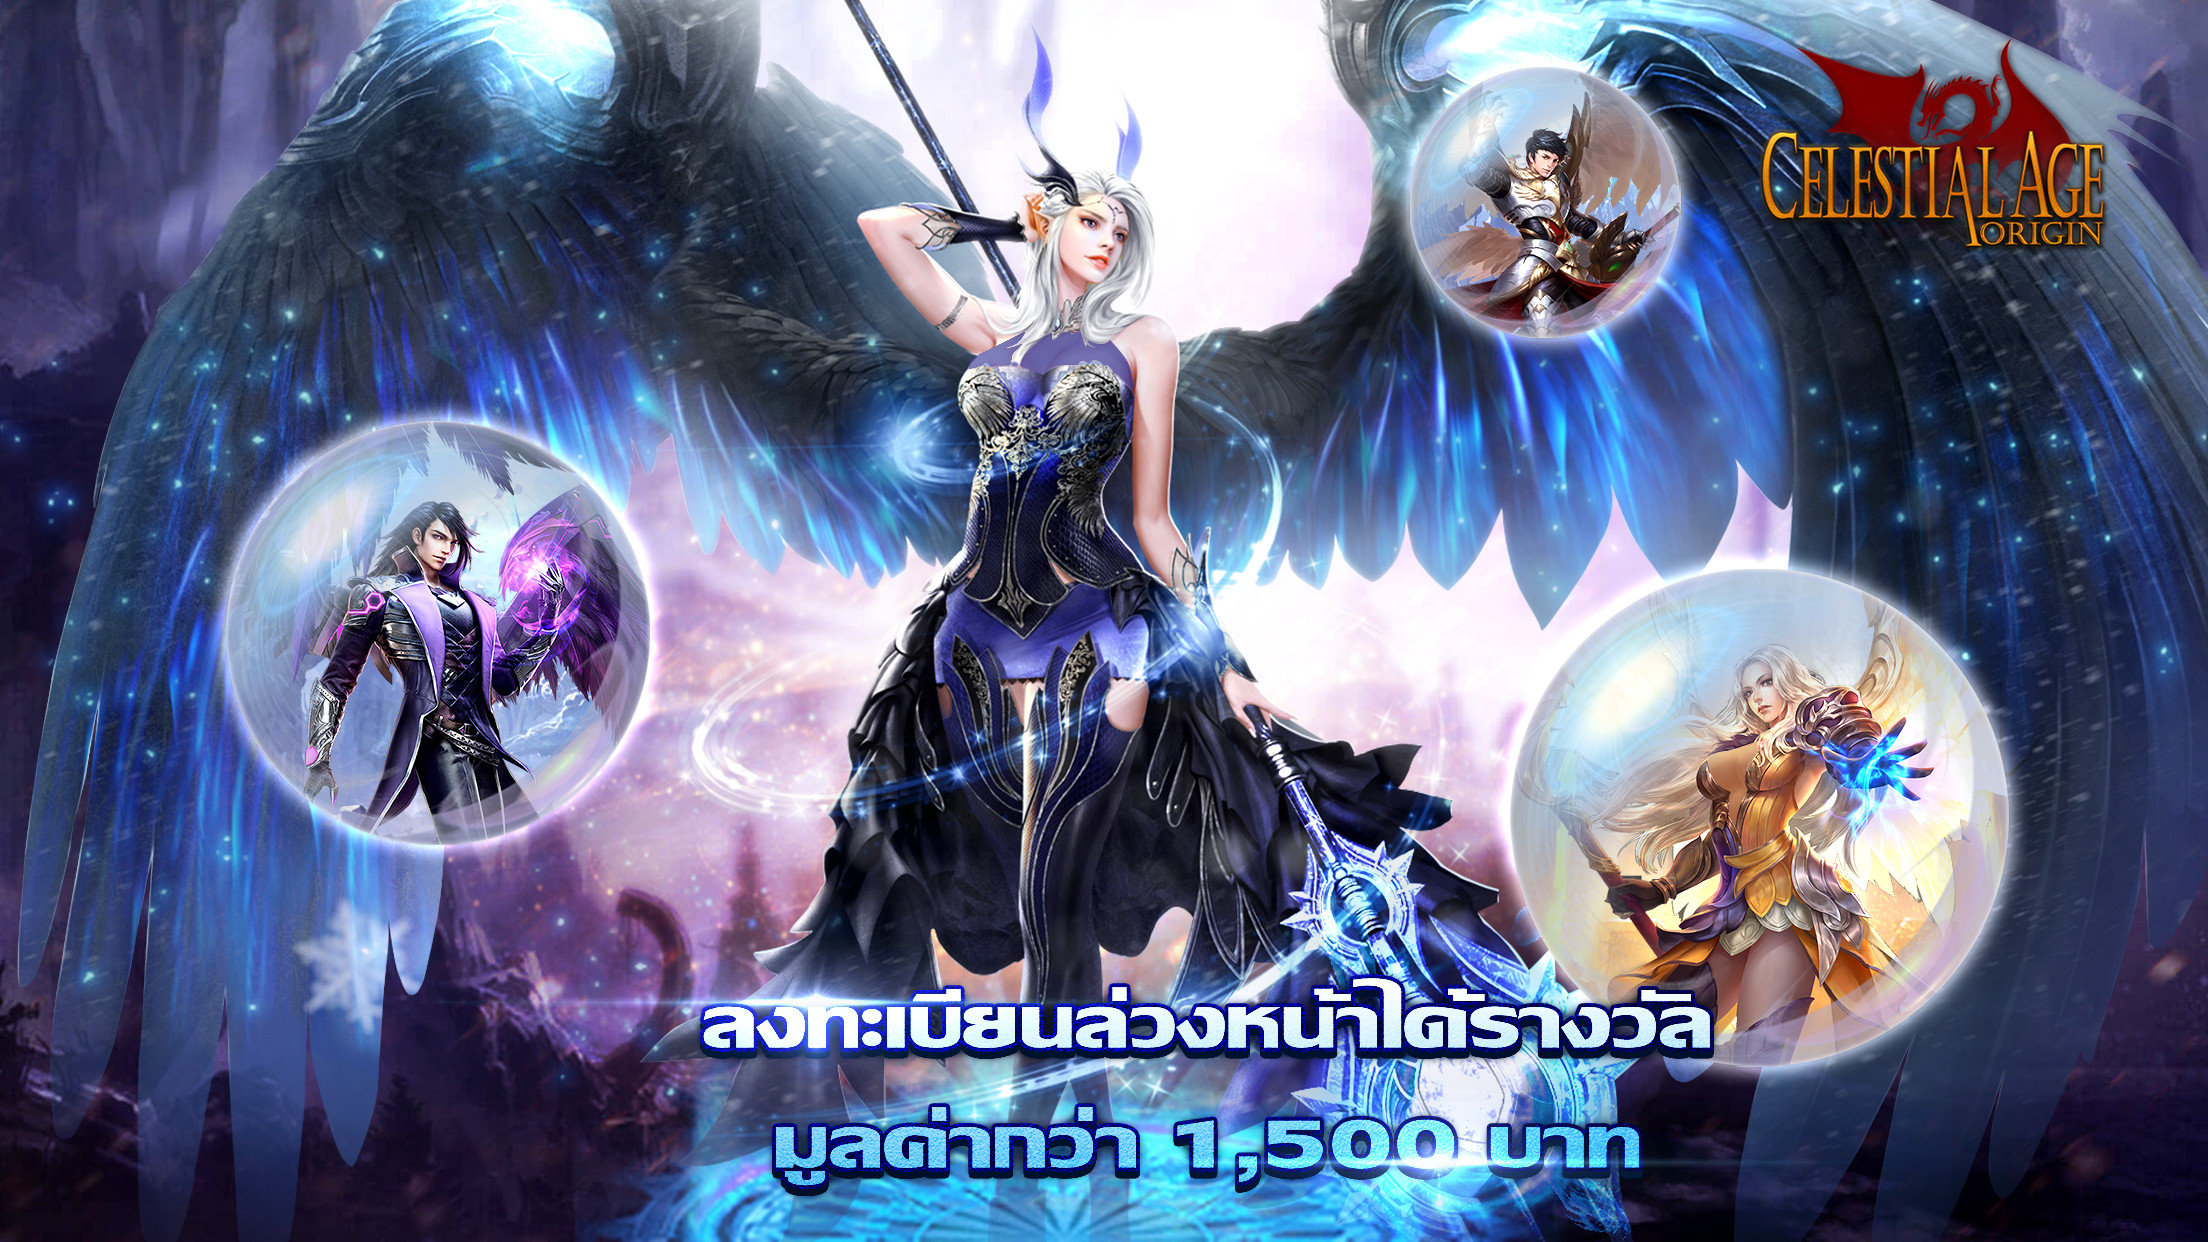 Celestial Age Origin28102091 1